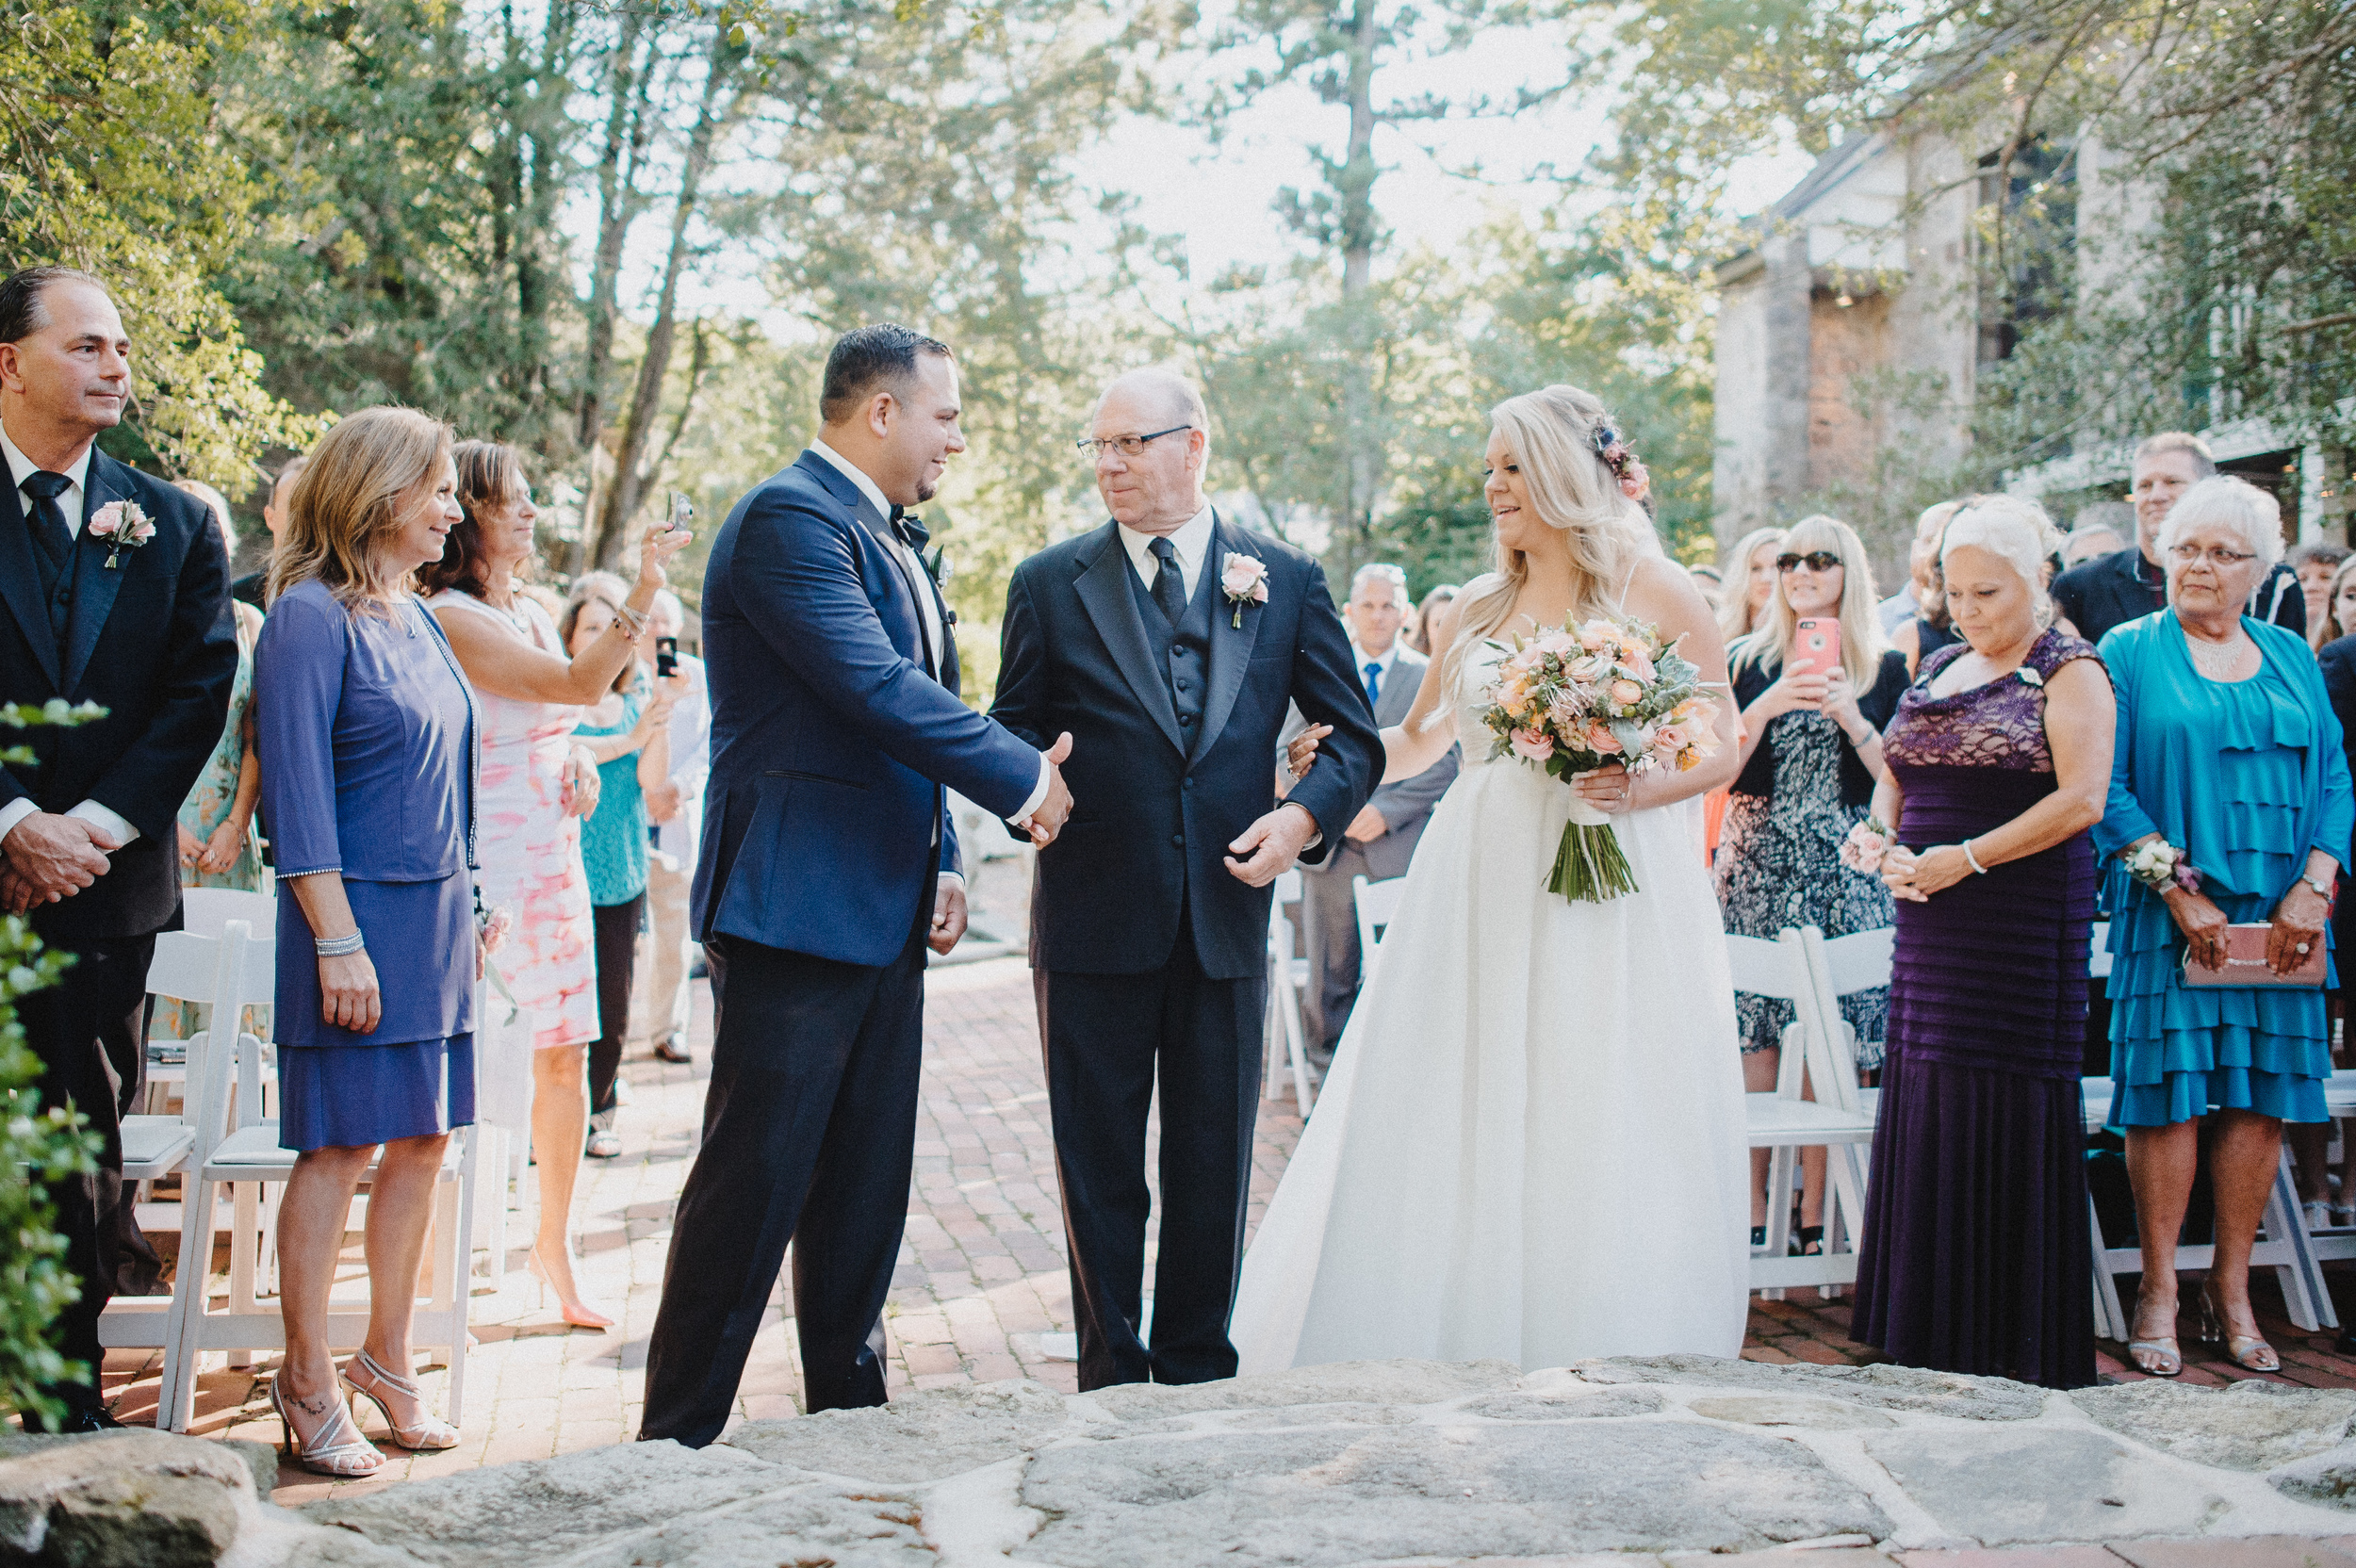 holly-hedge-estate-wedding-photographer-pat-robinson-photography-55.jpg